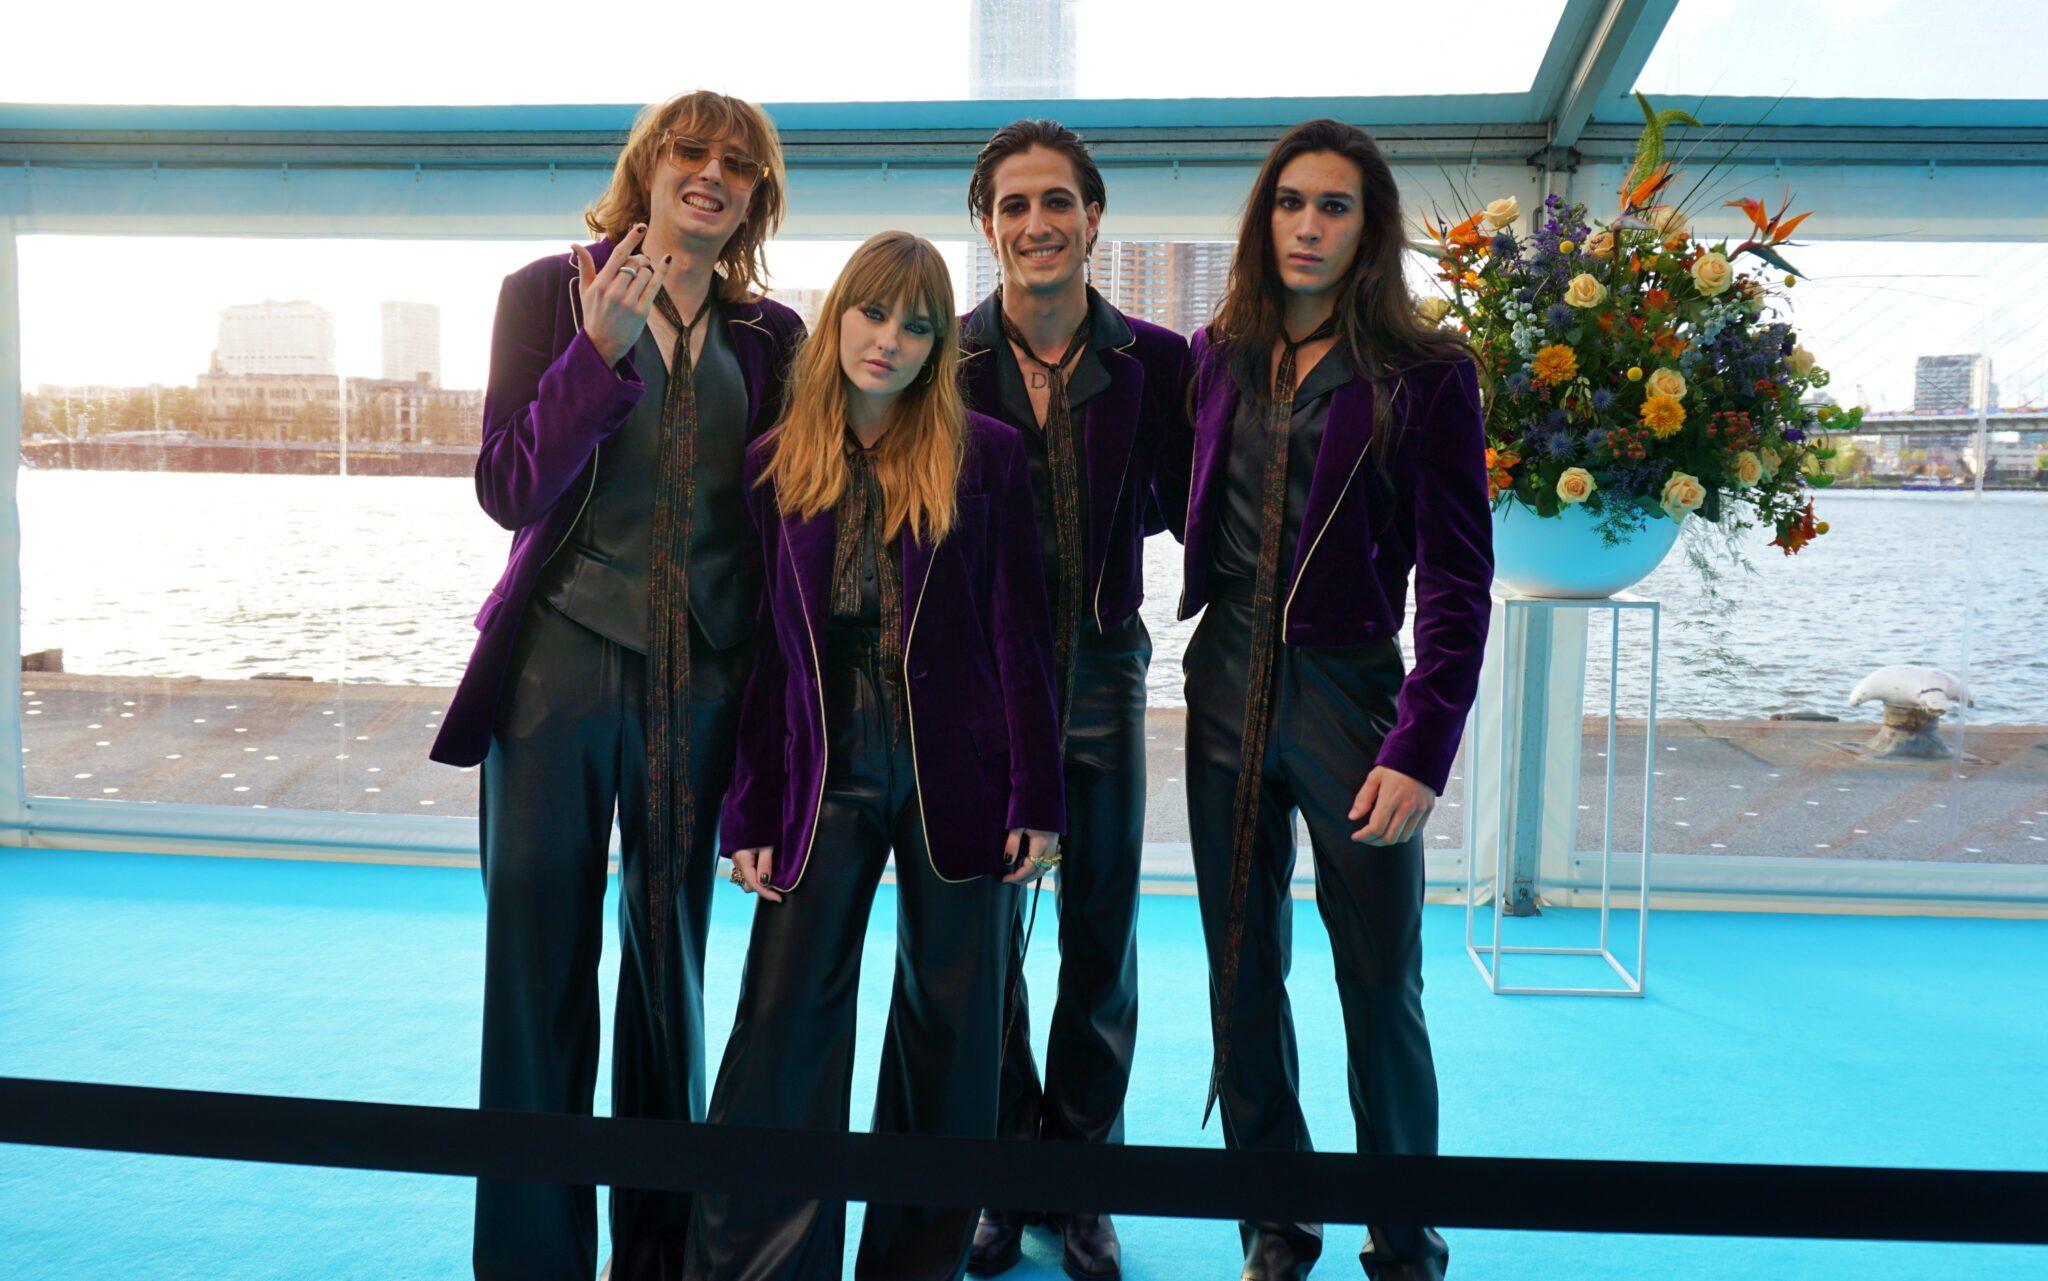 songfestival turquoise carpet